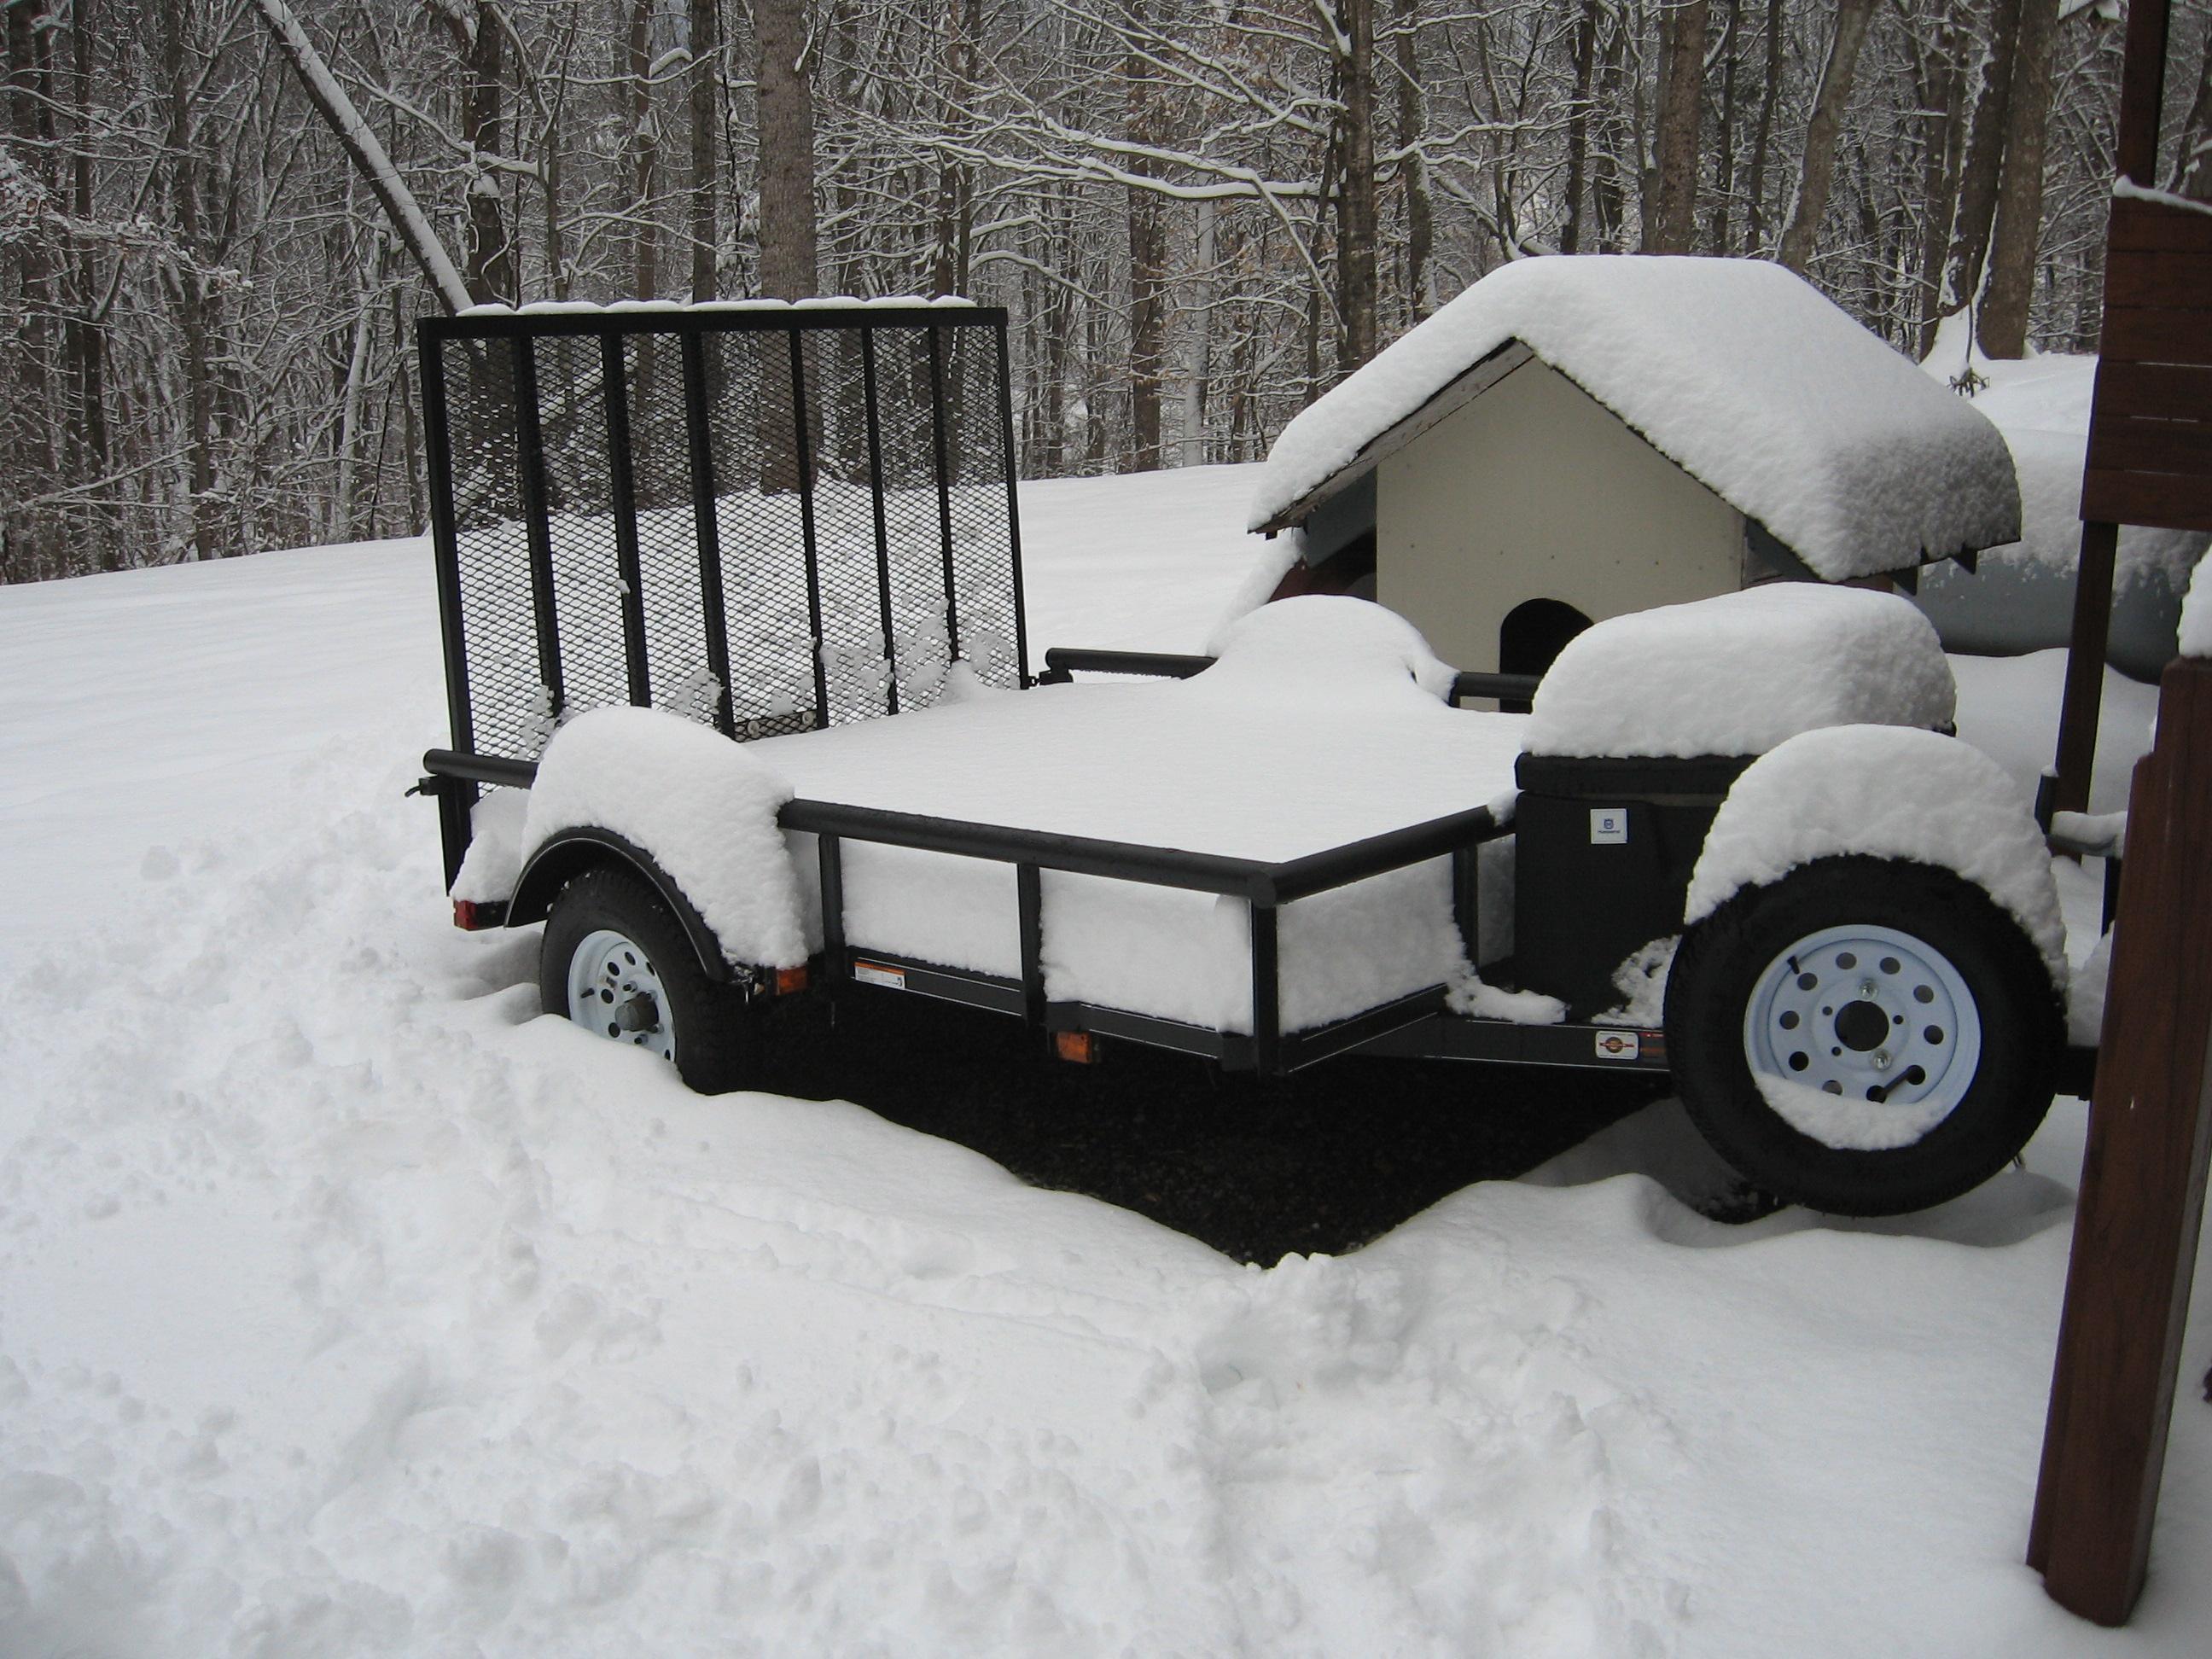 February 12 & 13 snow 016.JPG